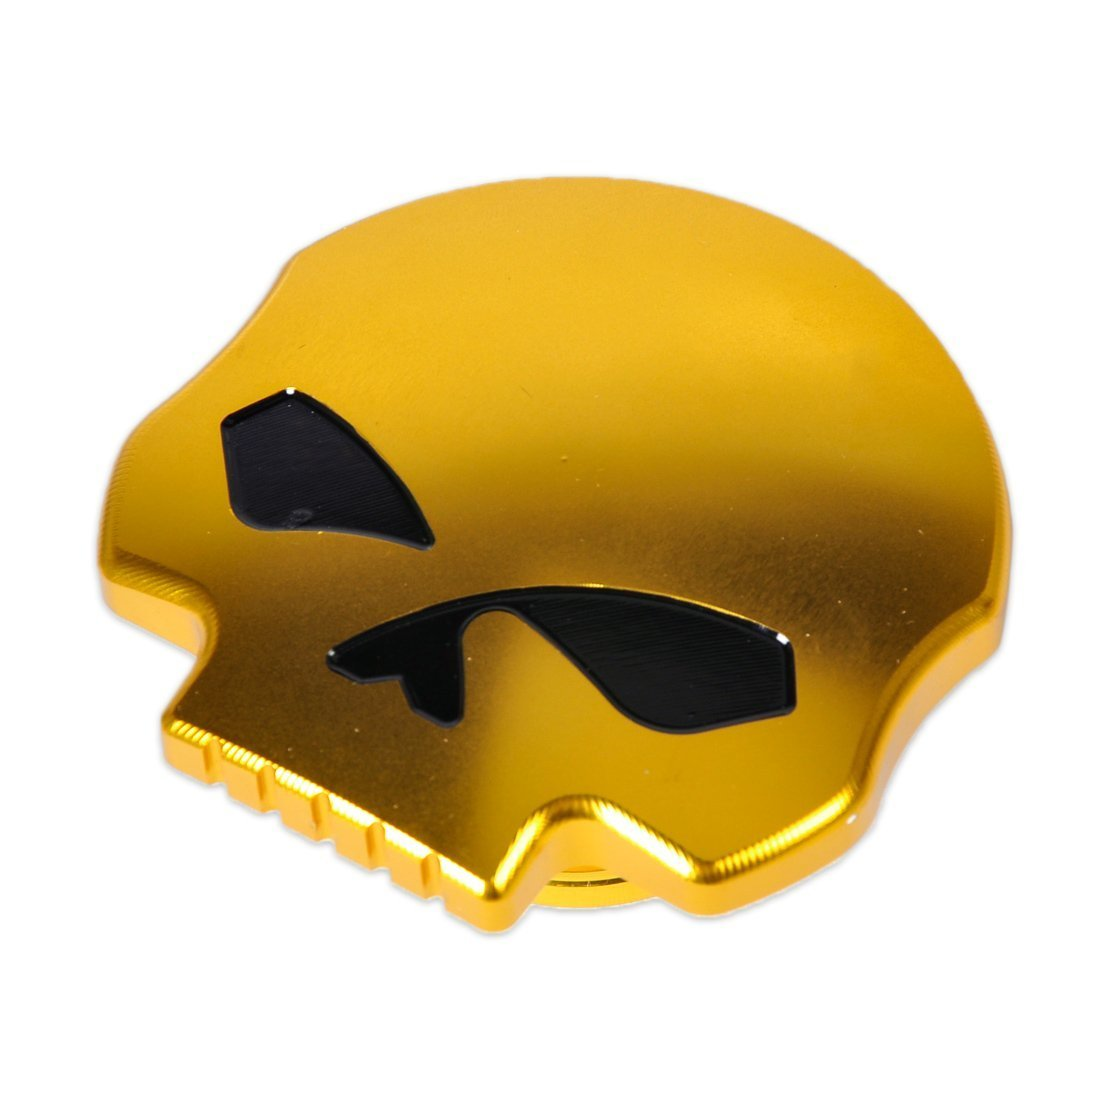 DLLL Motorcycle CNC Aluminum Skull Eye Fuel Gas Tank Oil Cap for Harley Davidson Sportster XL 1200 883 X48 Dyna Softail FXD FL XL FLT Big Twin Touring Road King (Gold) DLLL®